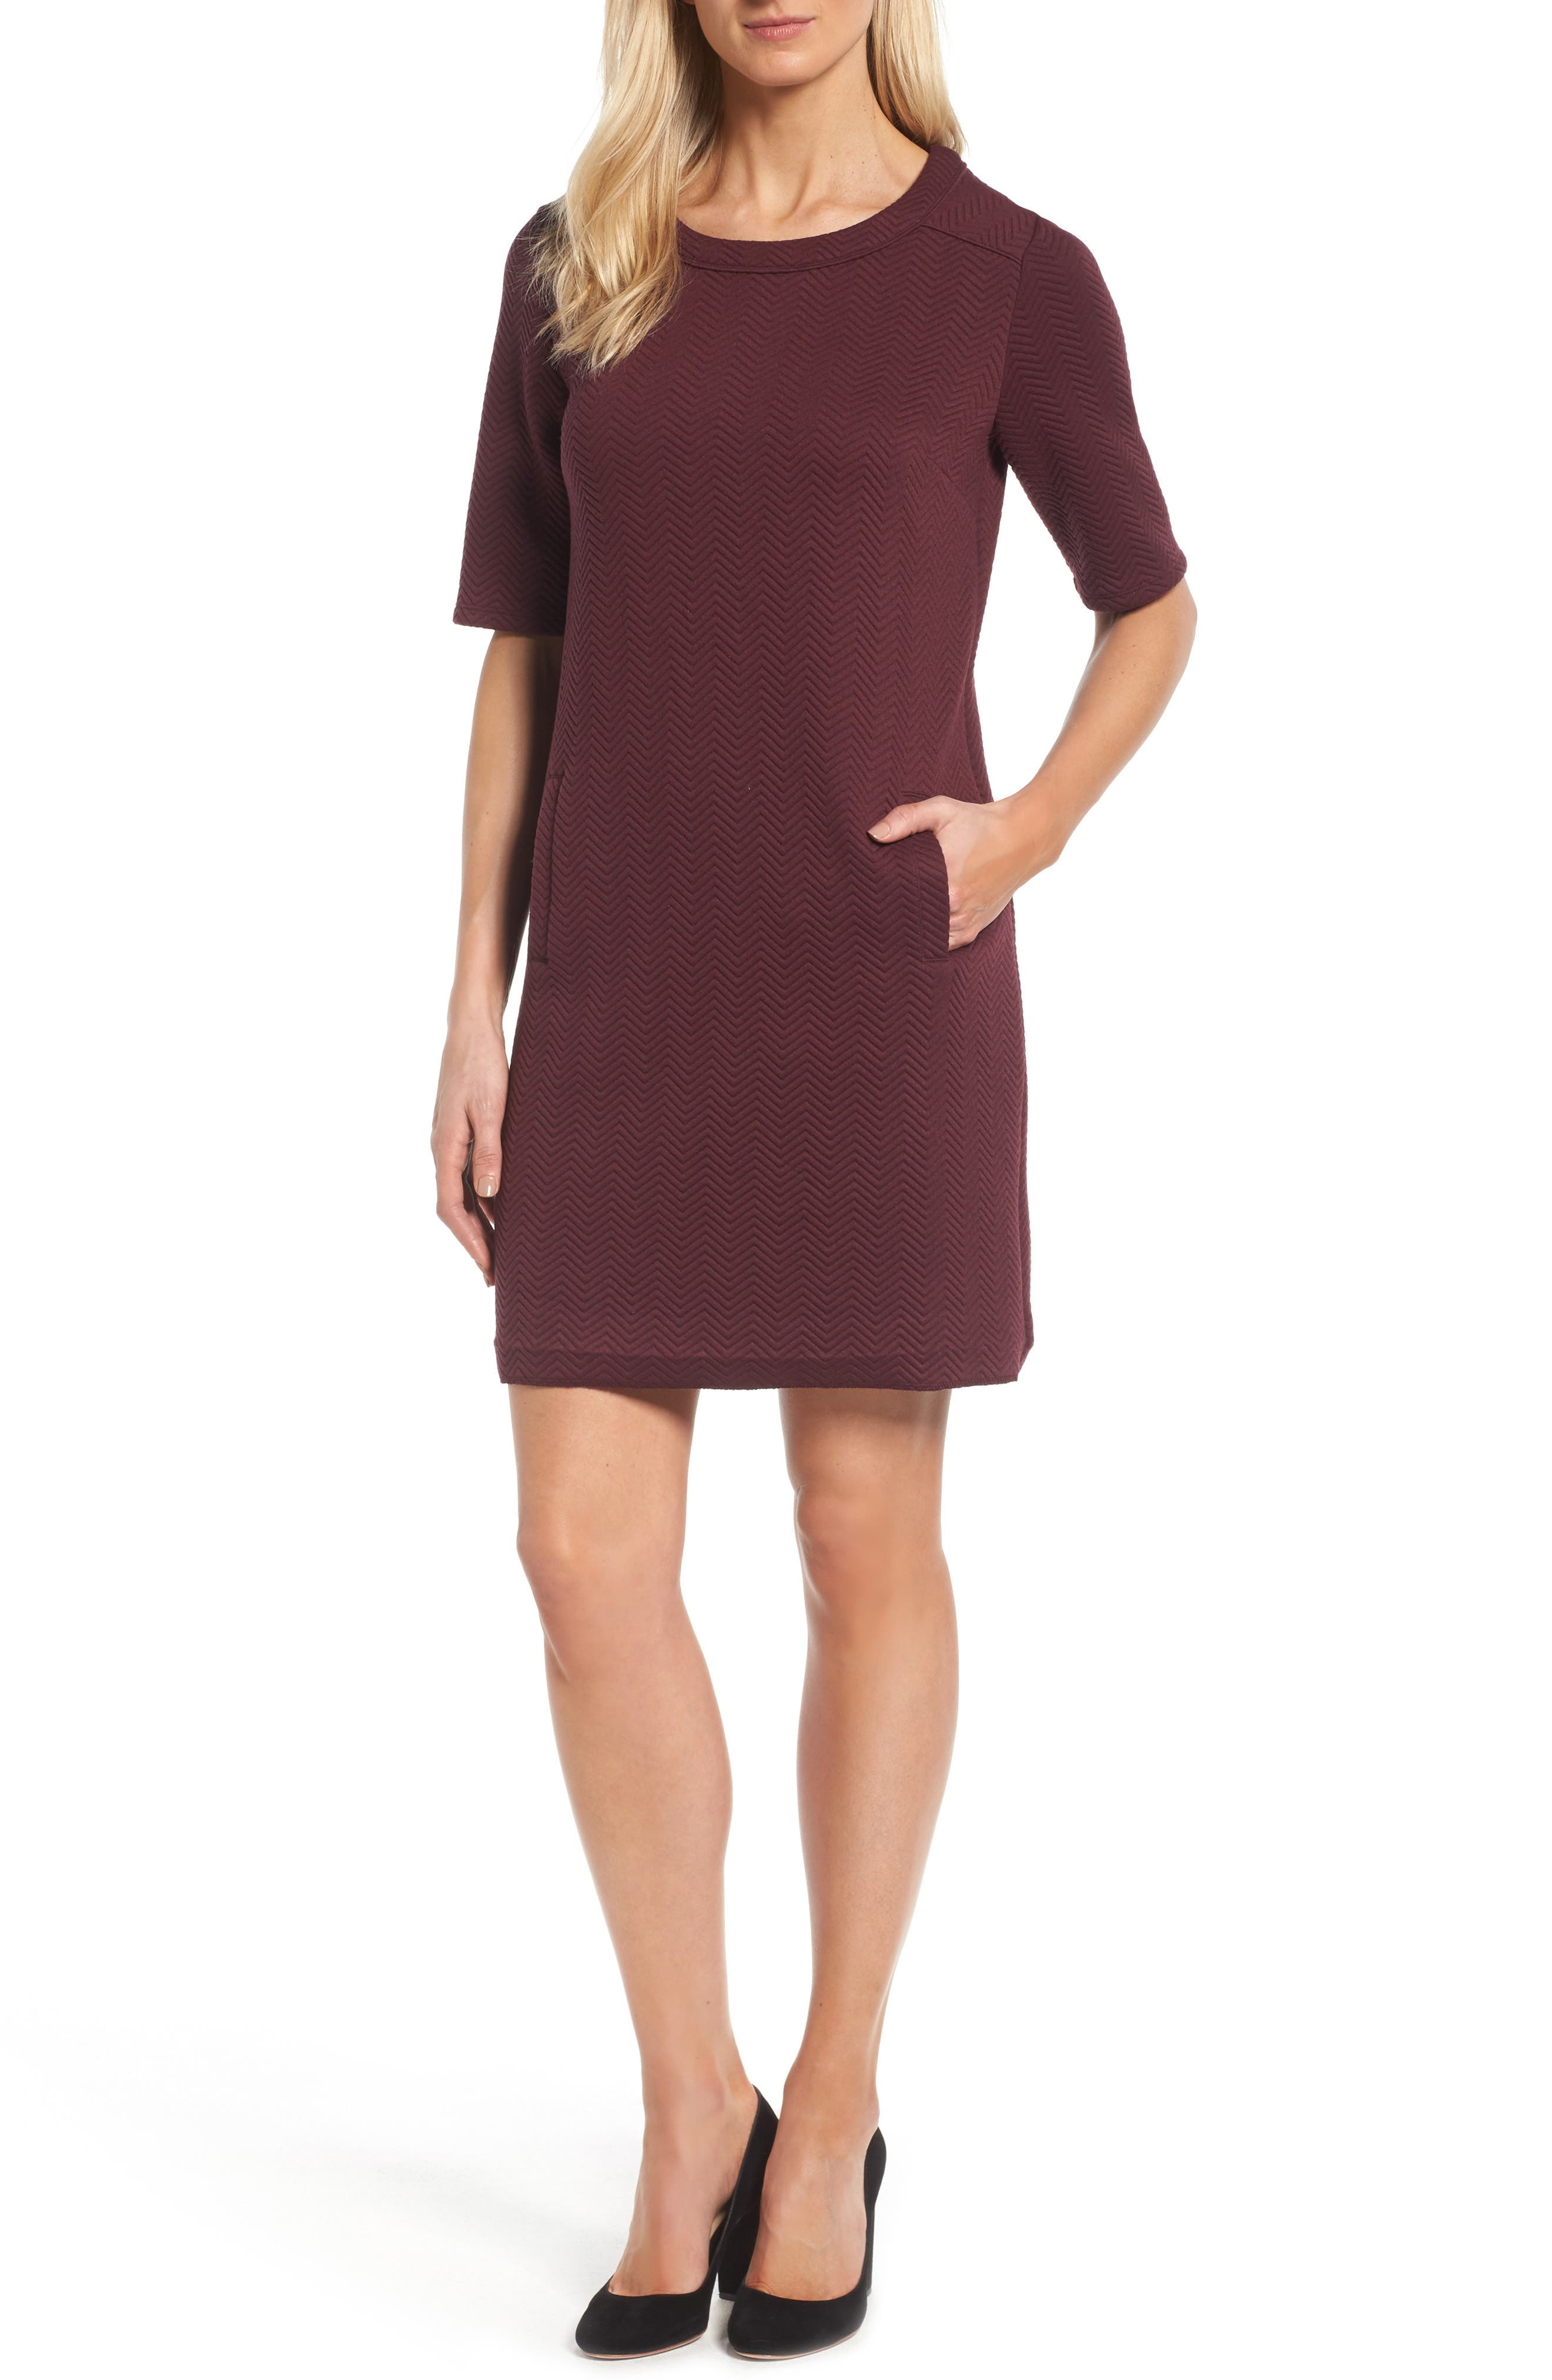 Main Image - Halogen® Textured Elbow Sleeve Tunic Dress (Regular & Petite)